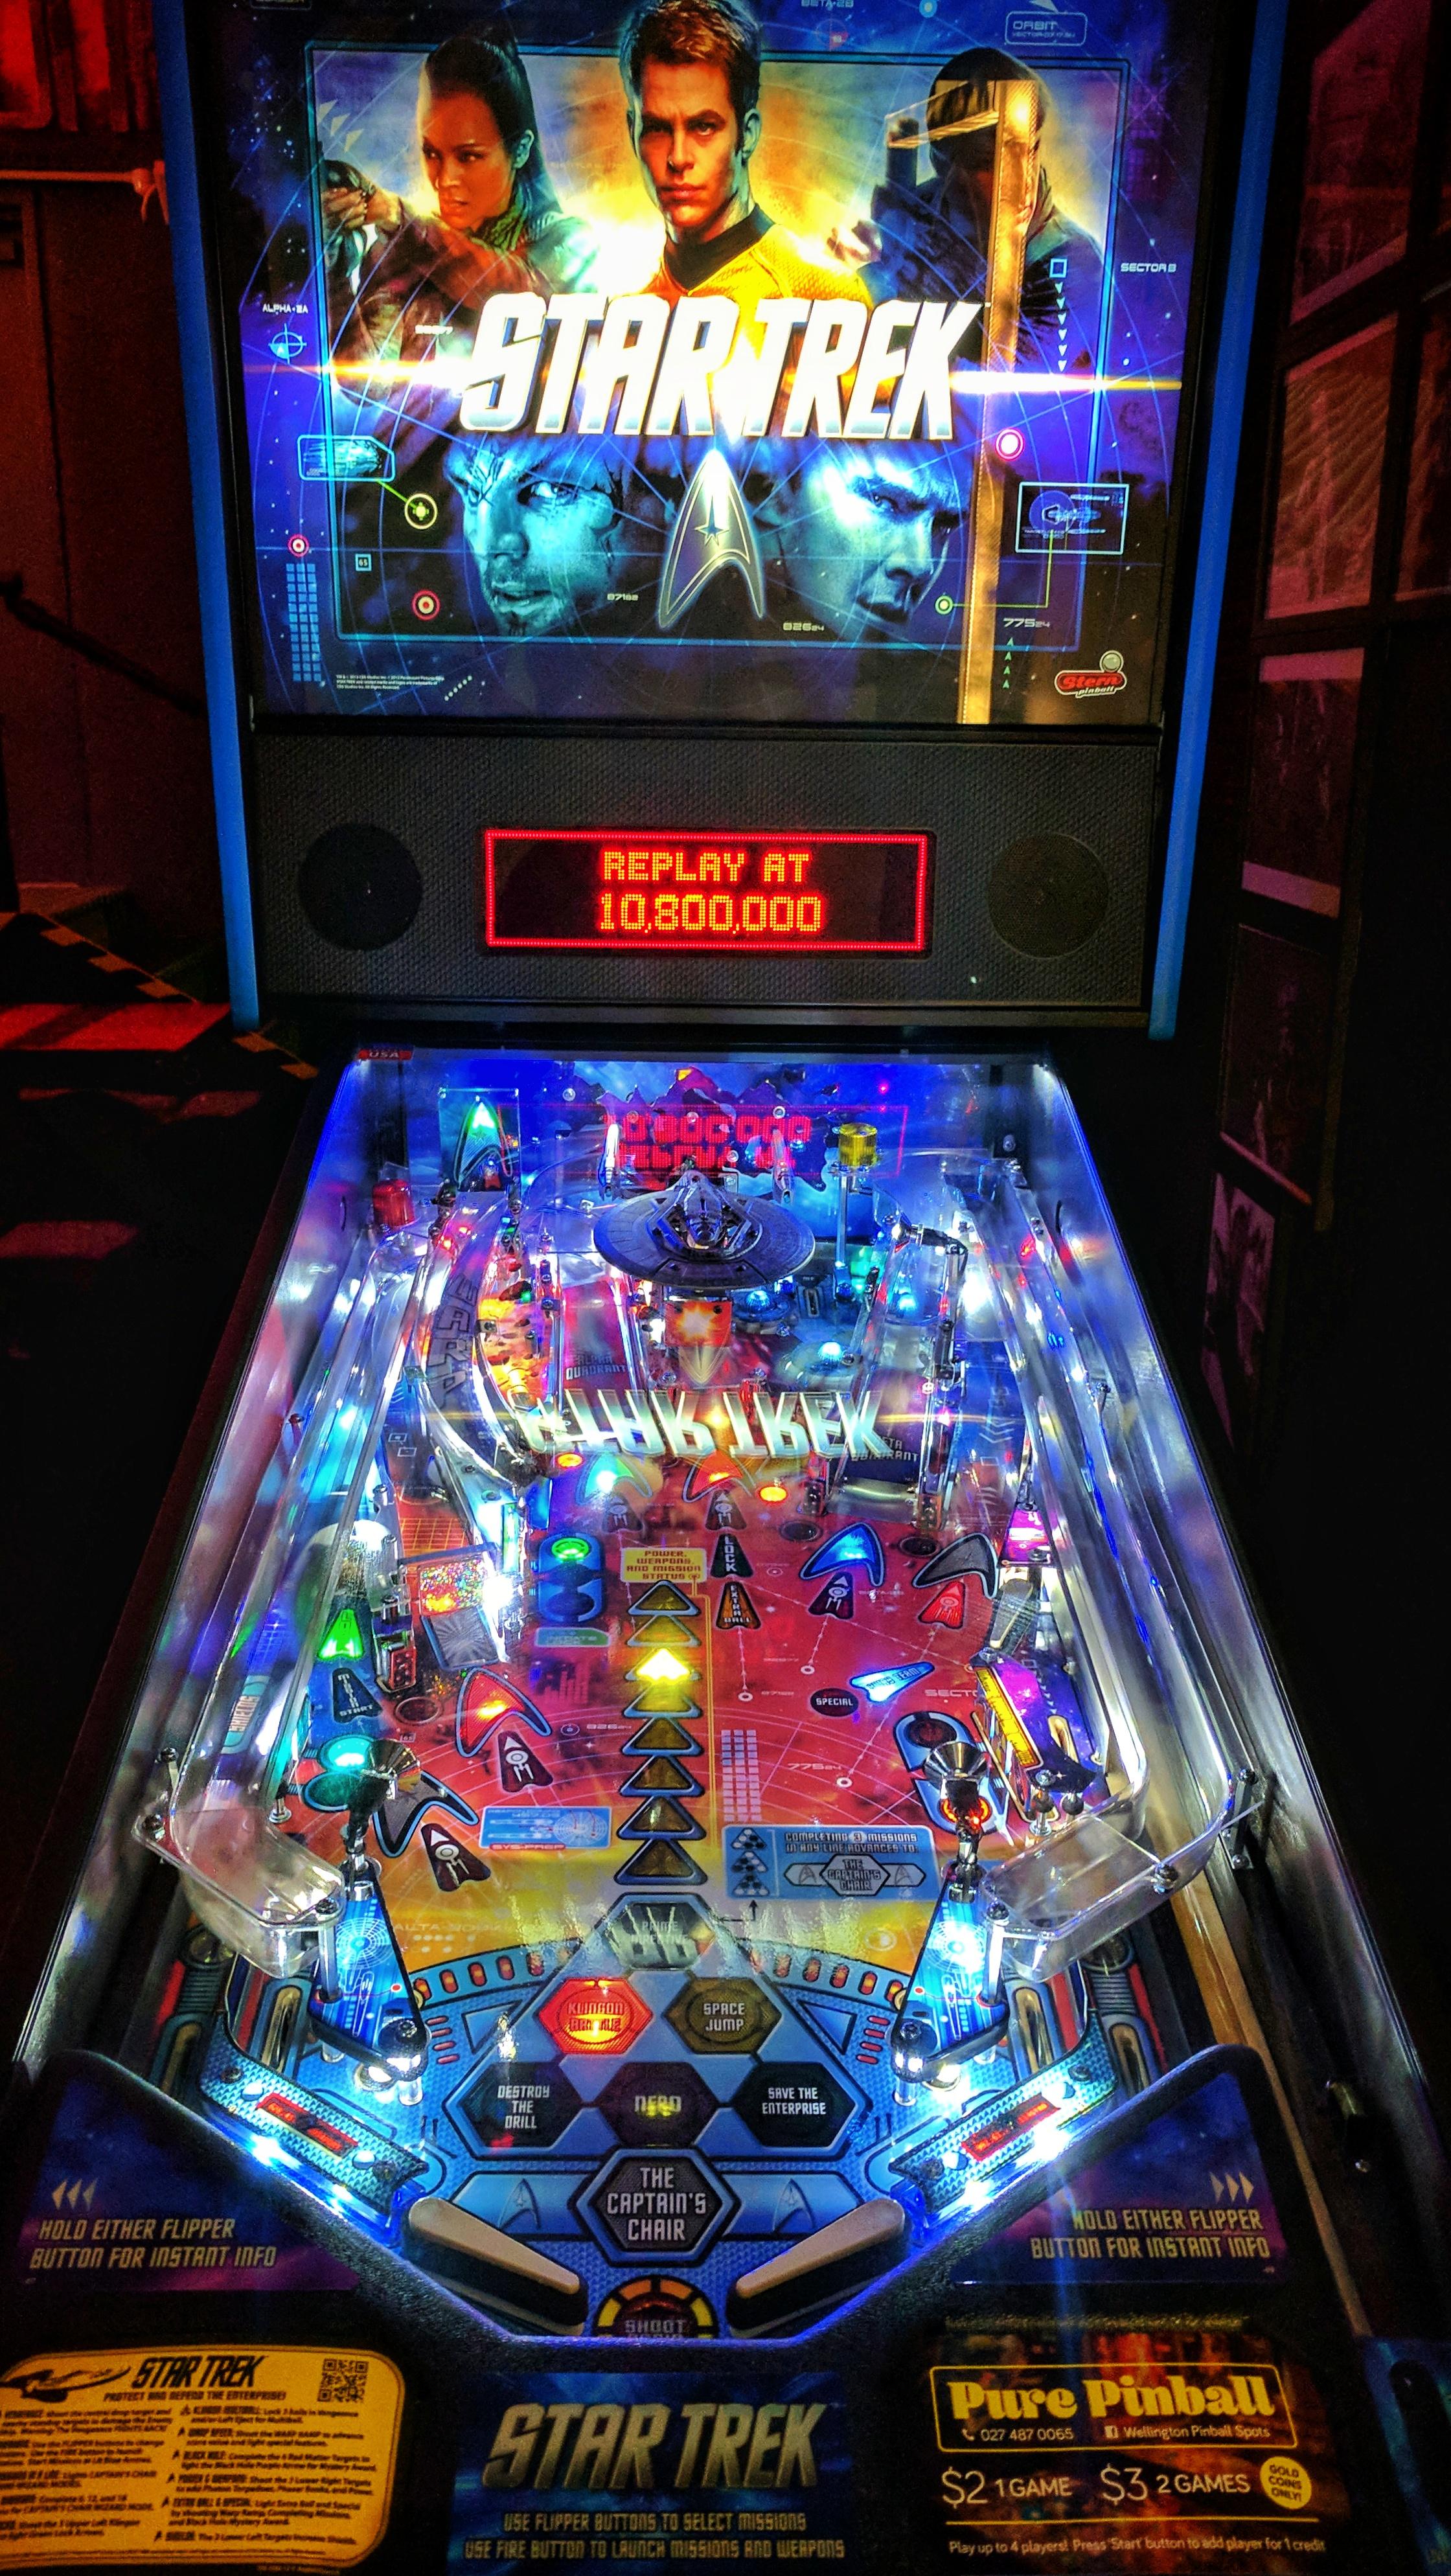 Star Trek pinball game